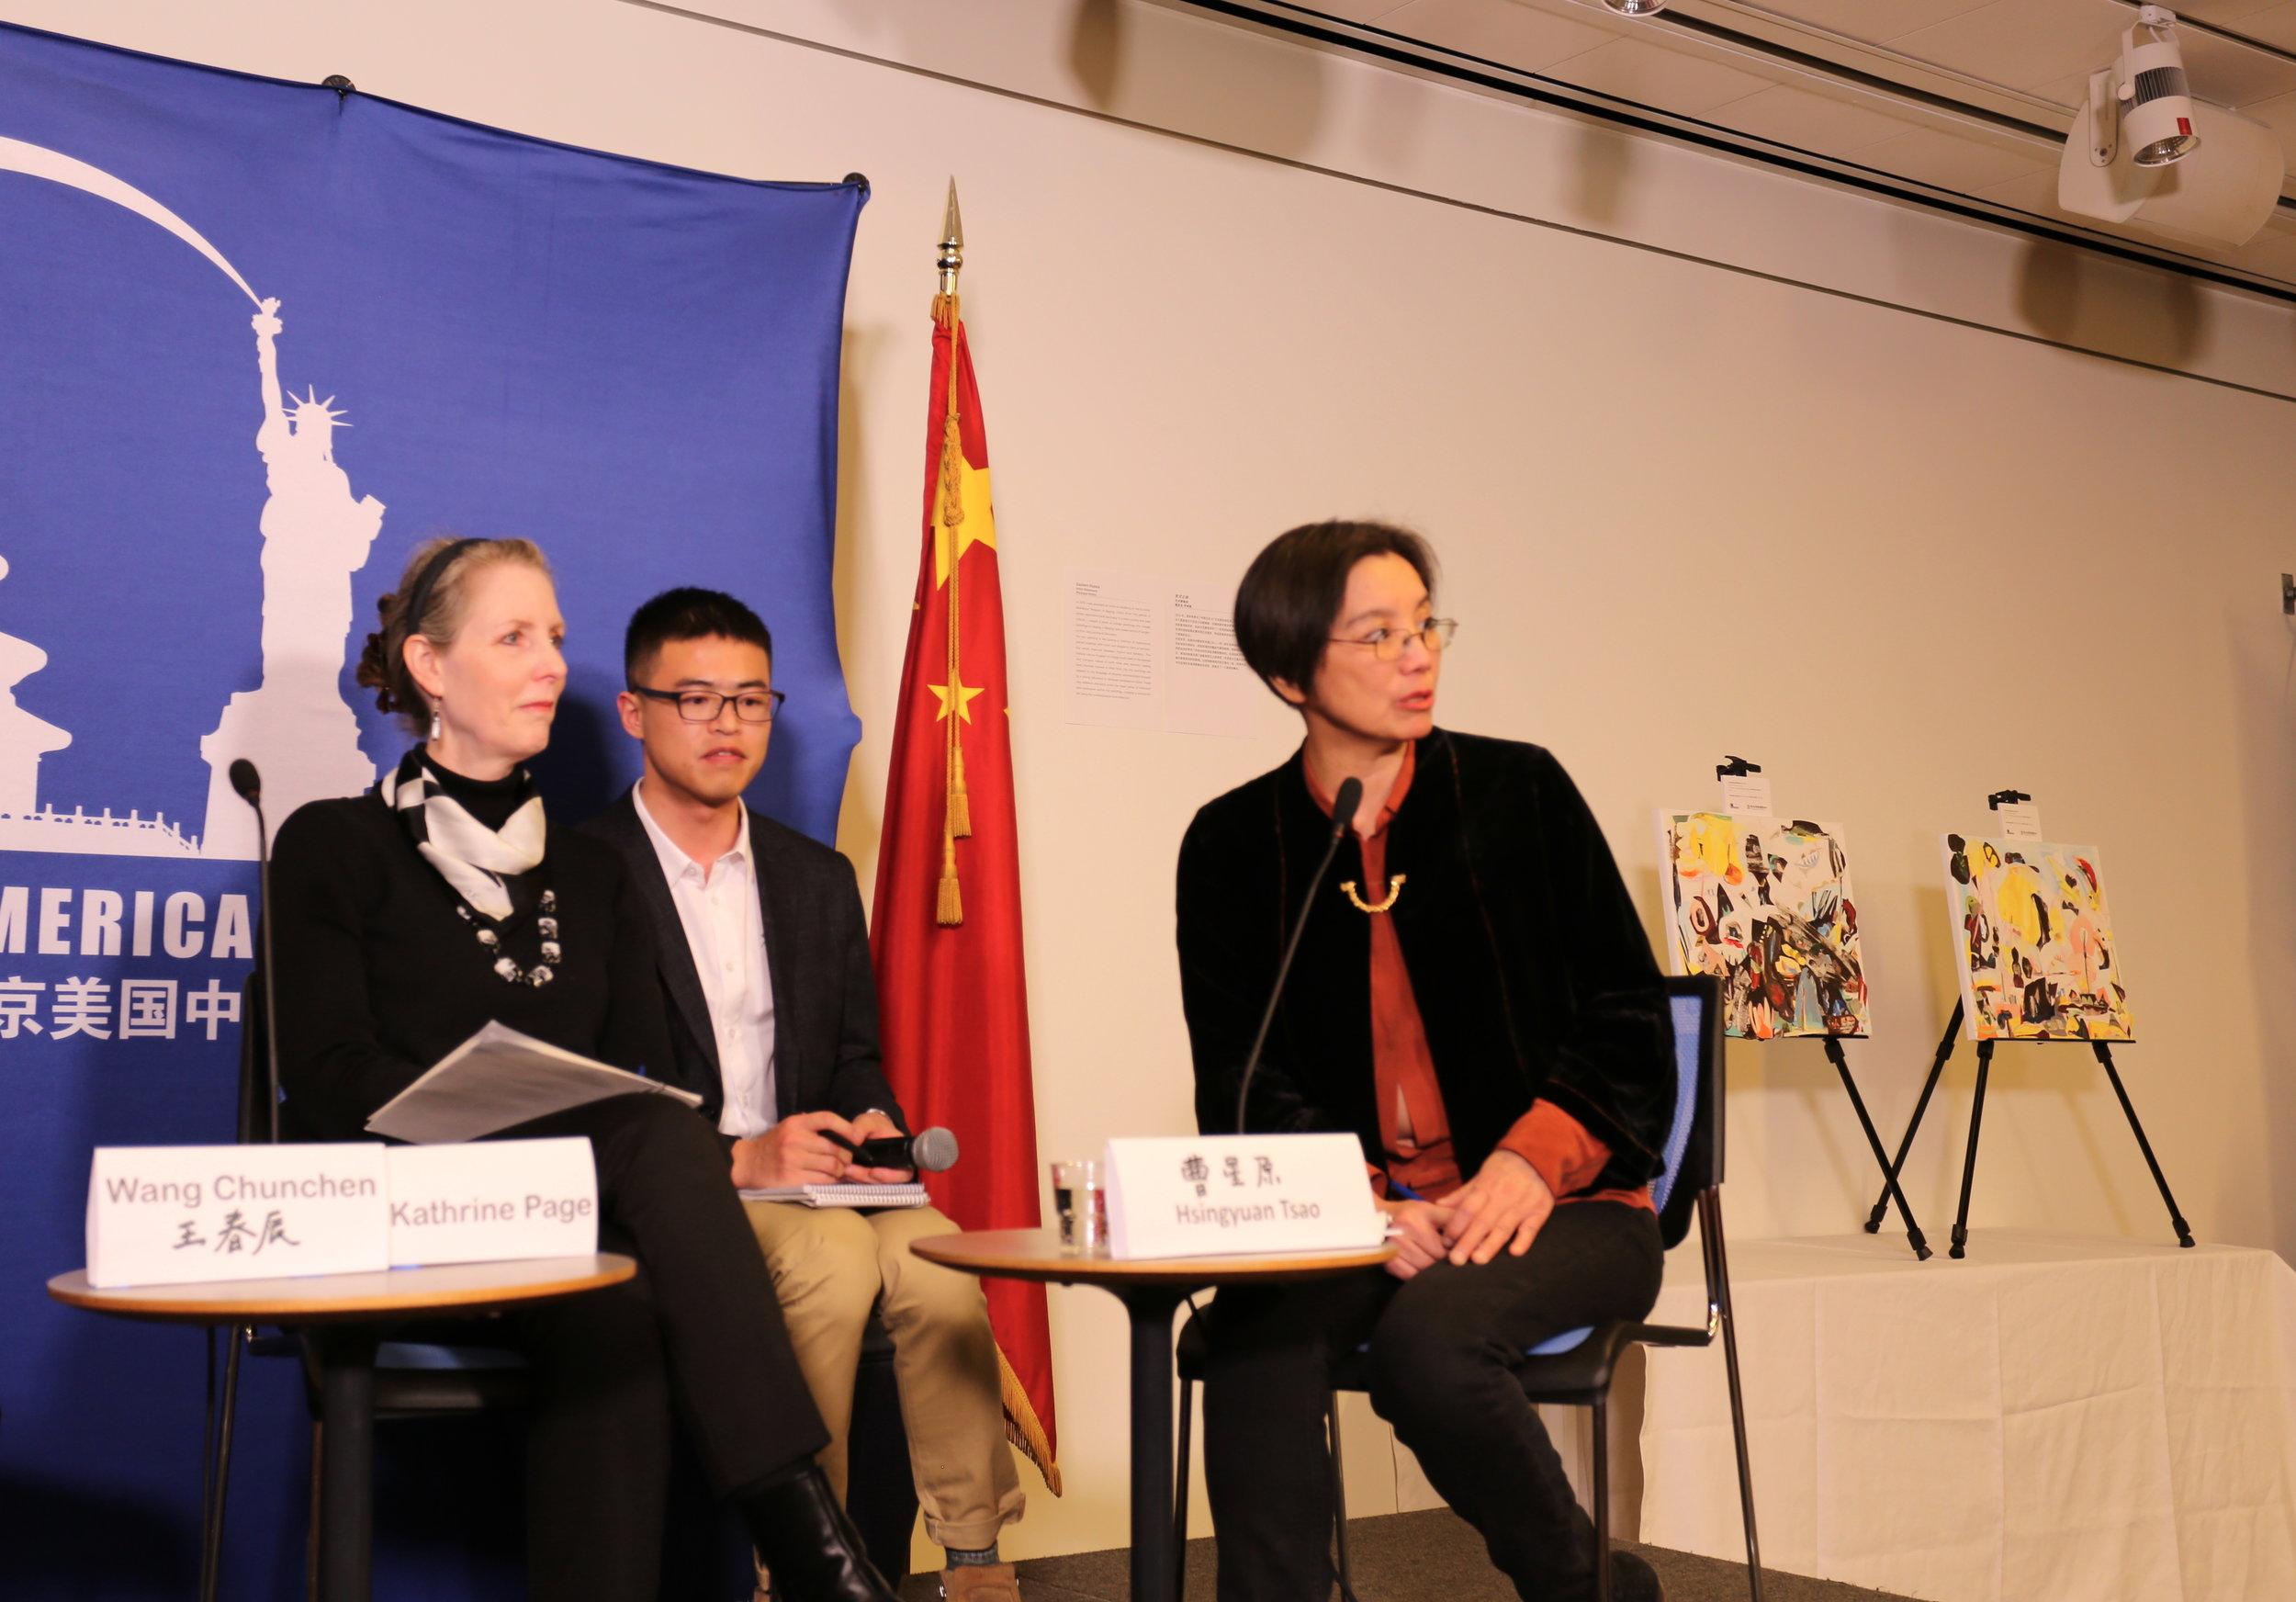 Professor Tsao introducing panelists